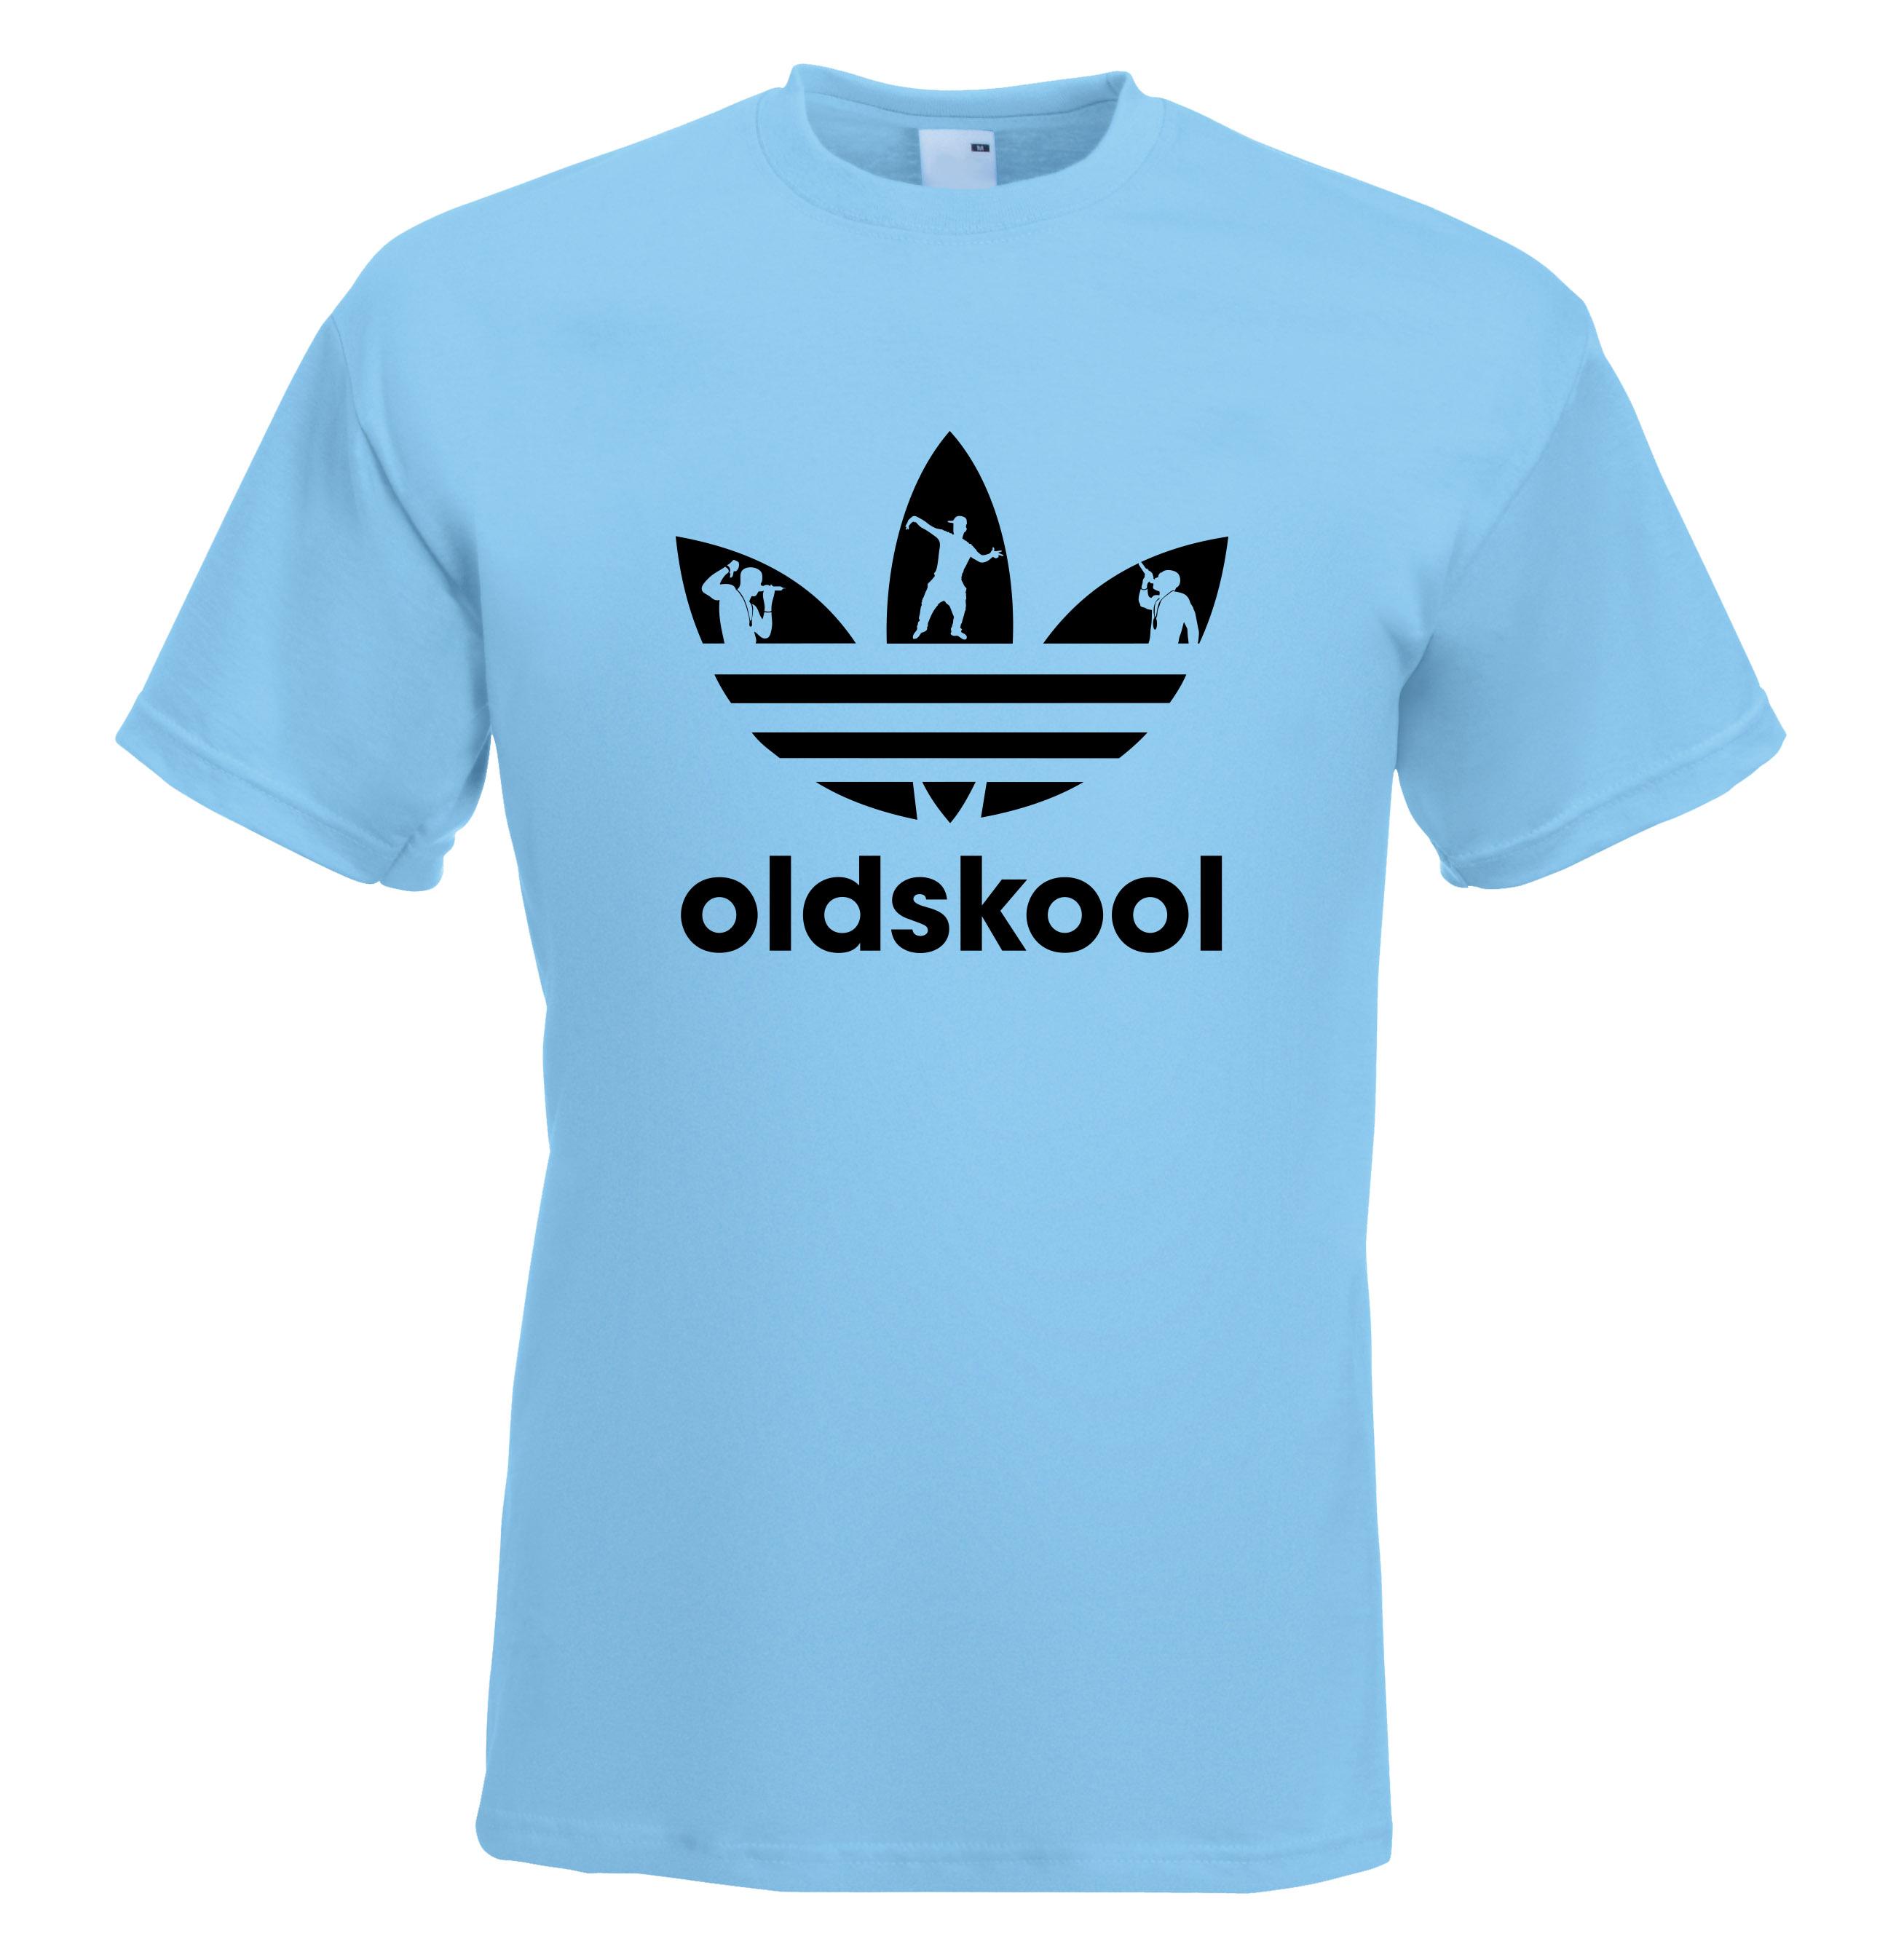 Juko Old Skool T Shirt 1337 Acid House Retro Rave T   eBay